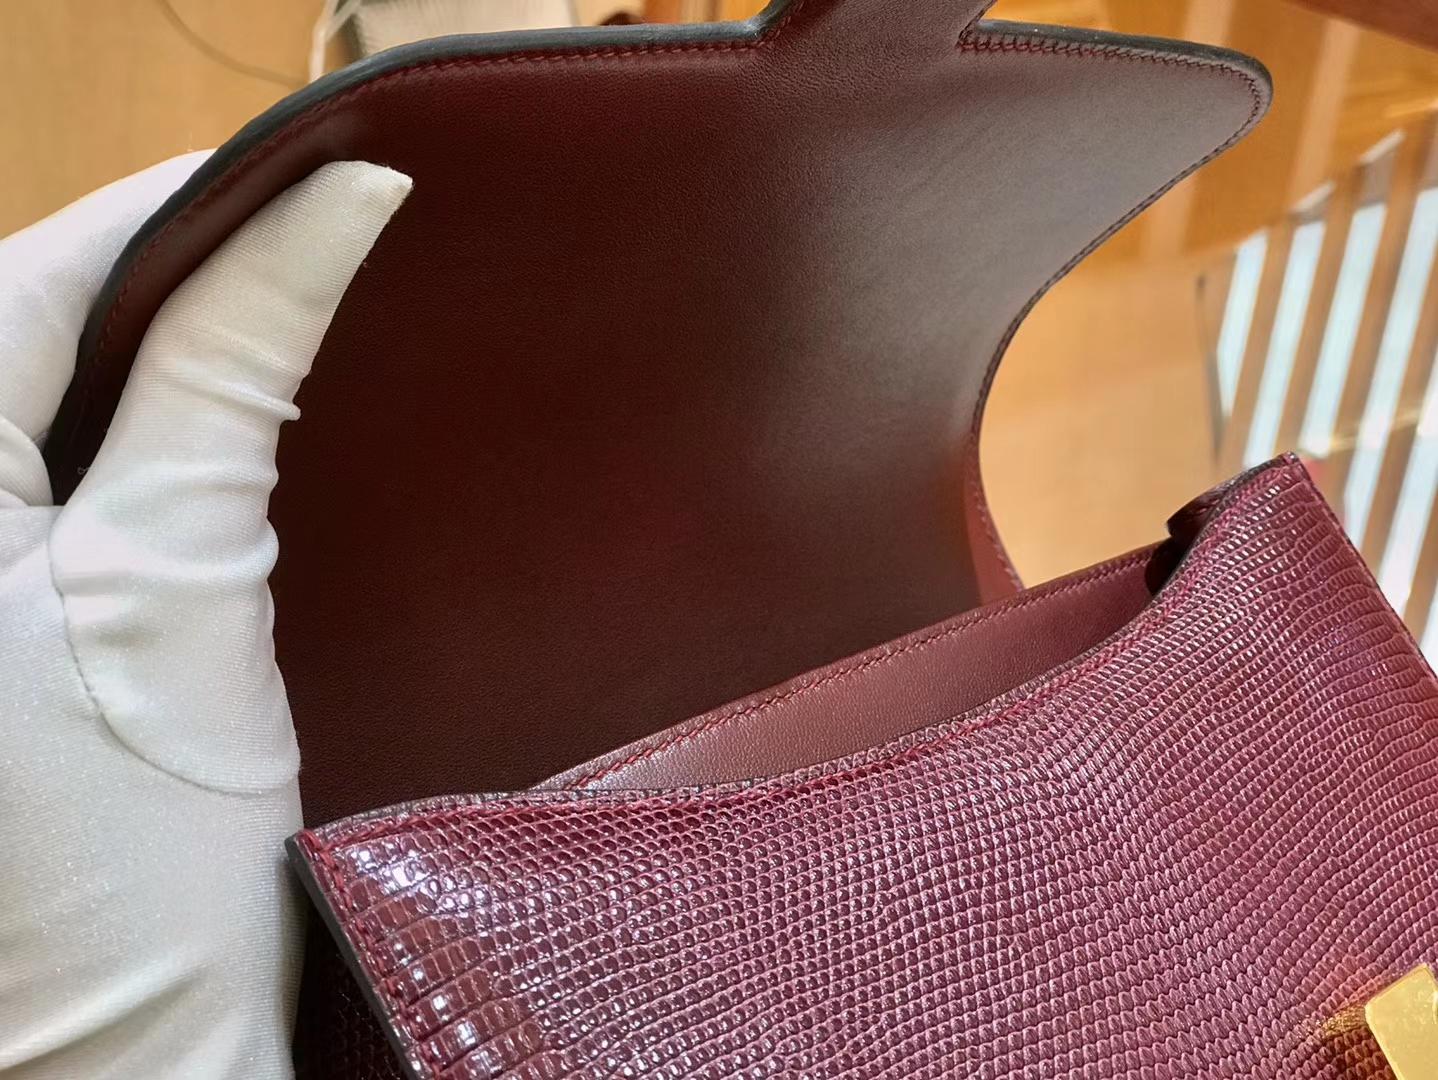 Hermès(爱马仕)Constance 24cm 波尔多酒红 南非蜥蜴皮 全手工缝制